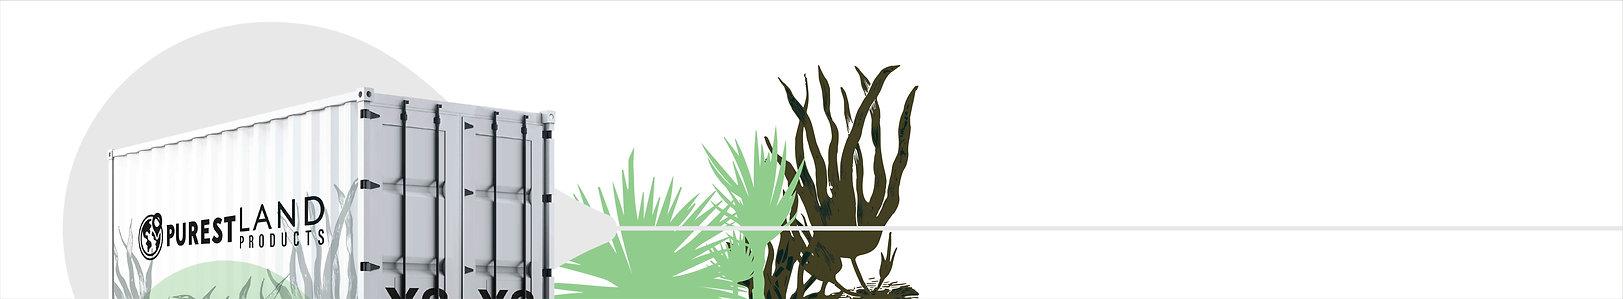 PurestLandProdcuts_graficos_web-09.jpg